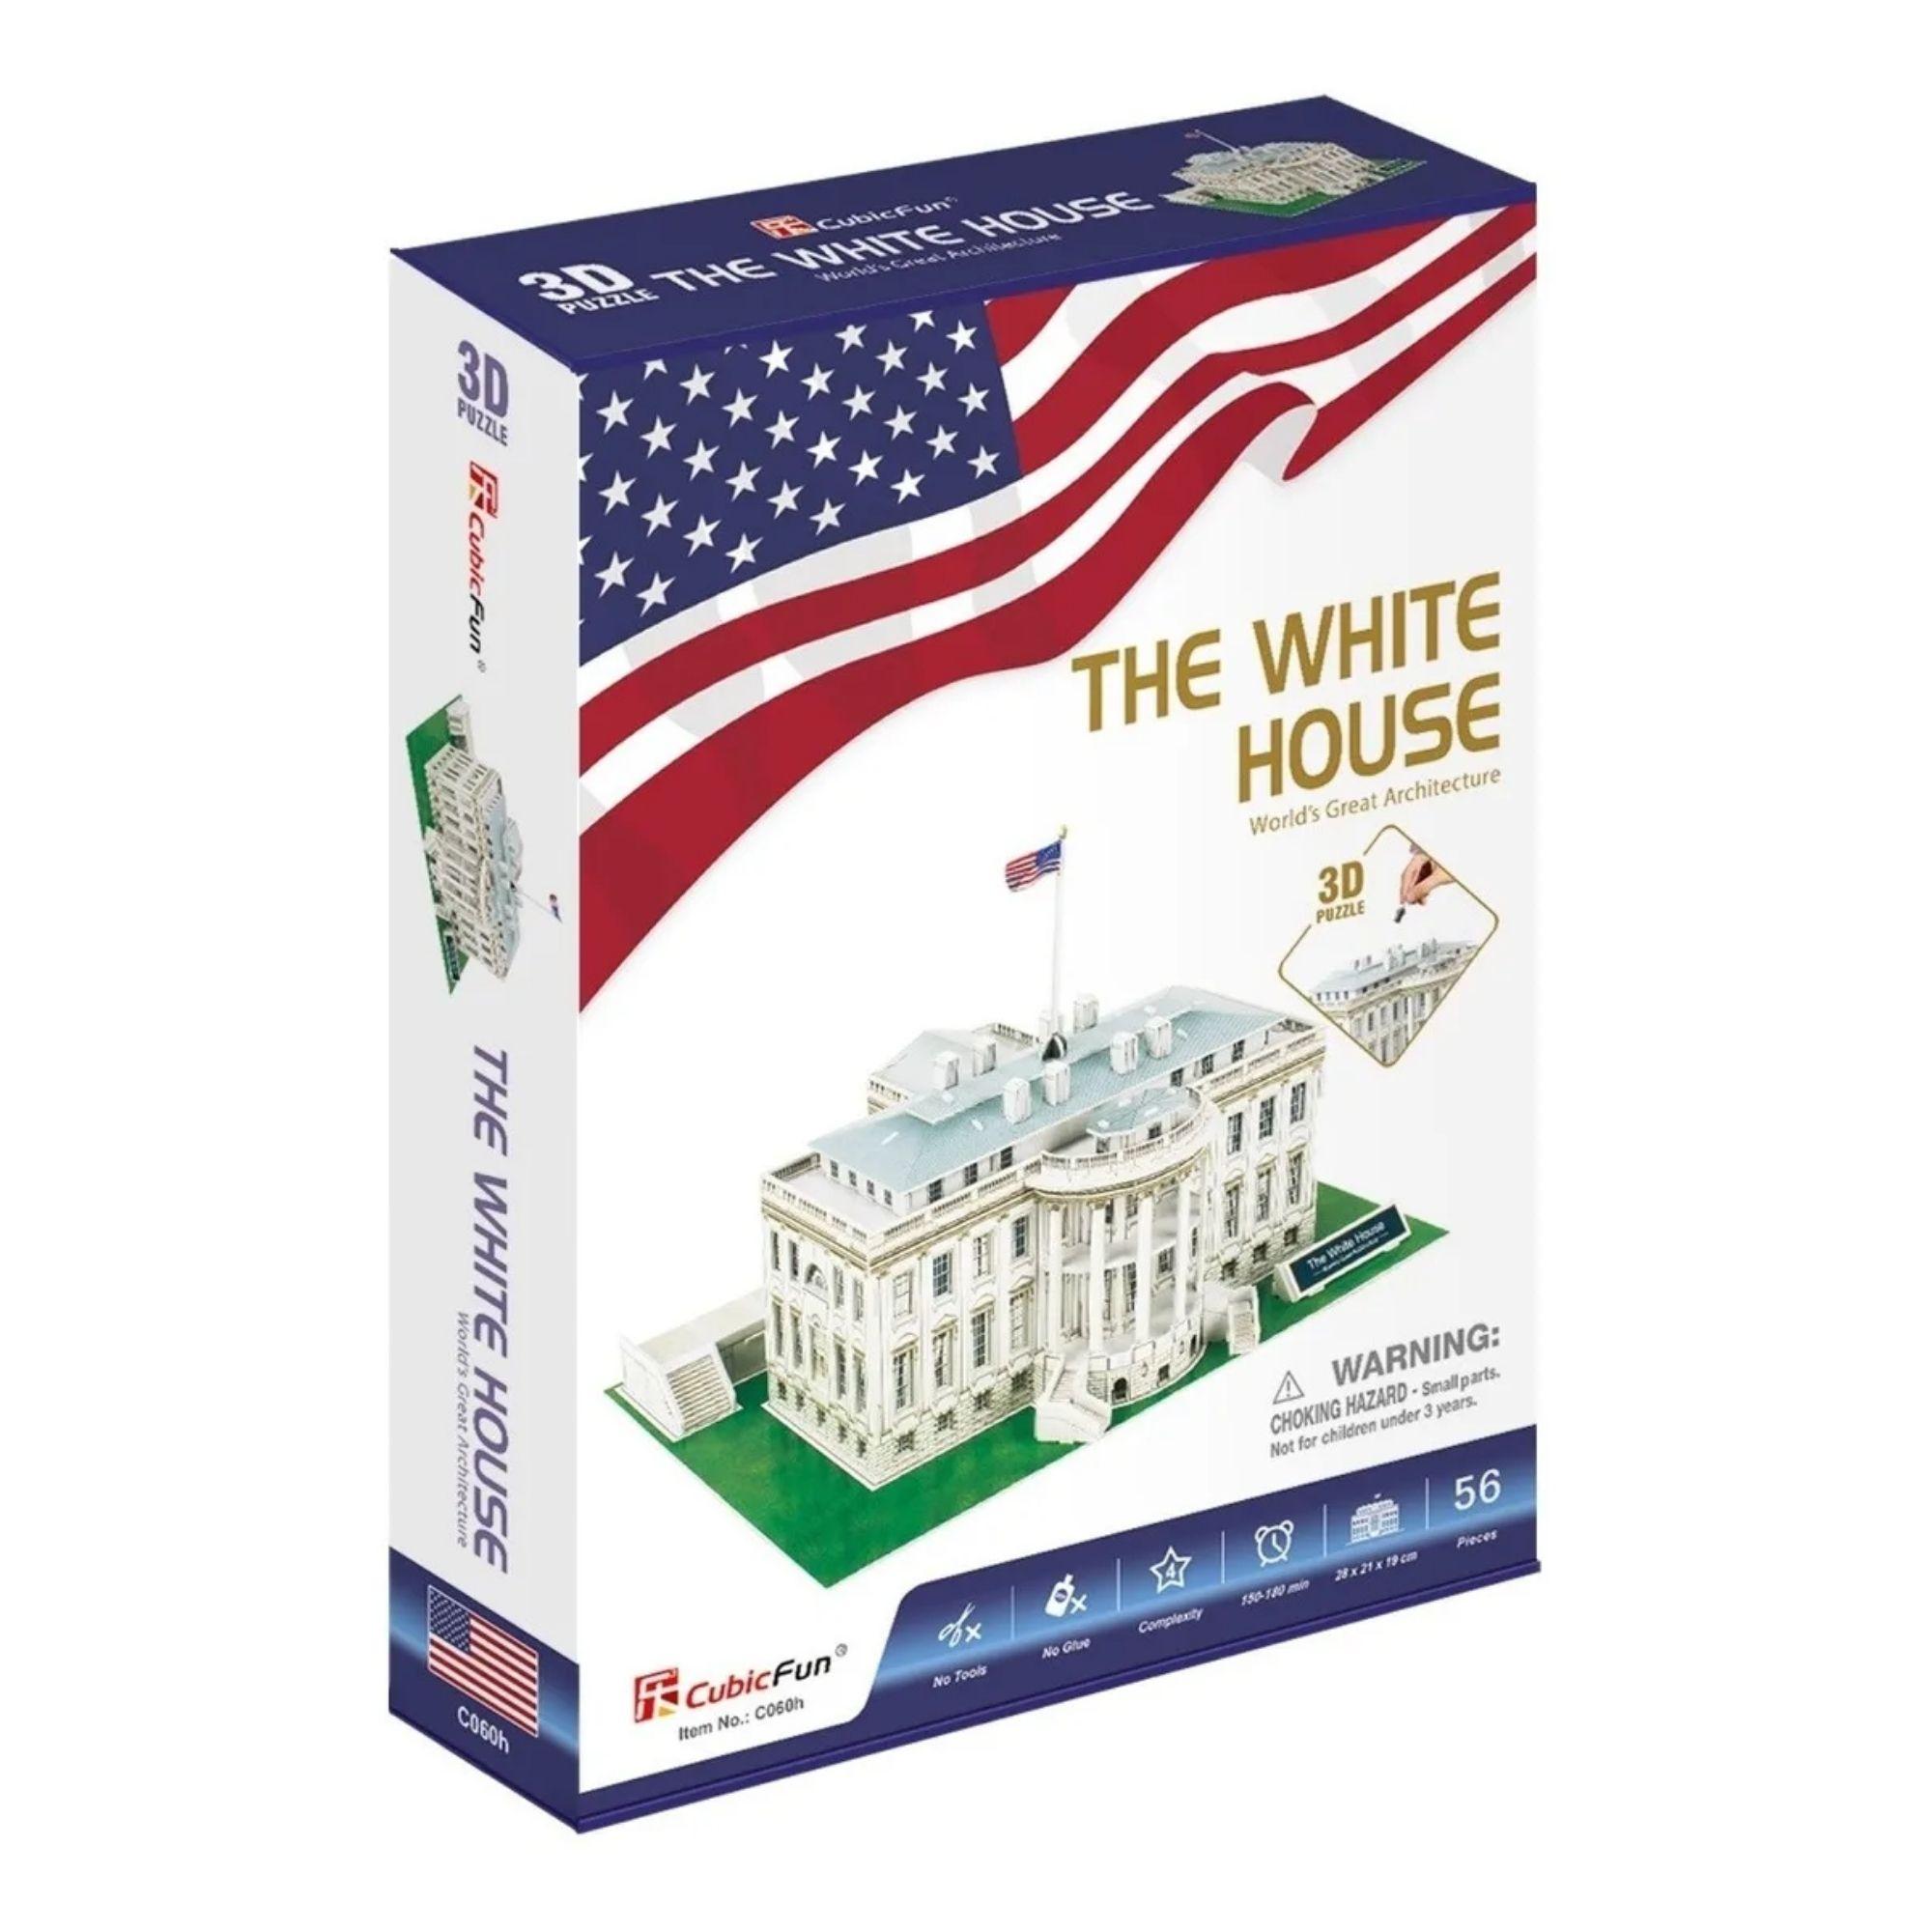 Quebra-cabeça 3D - A Casa Branca - 56 peças - CubicFun